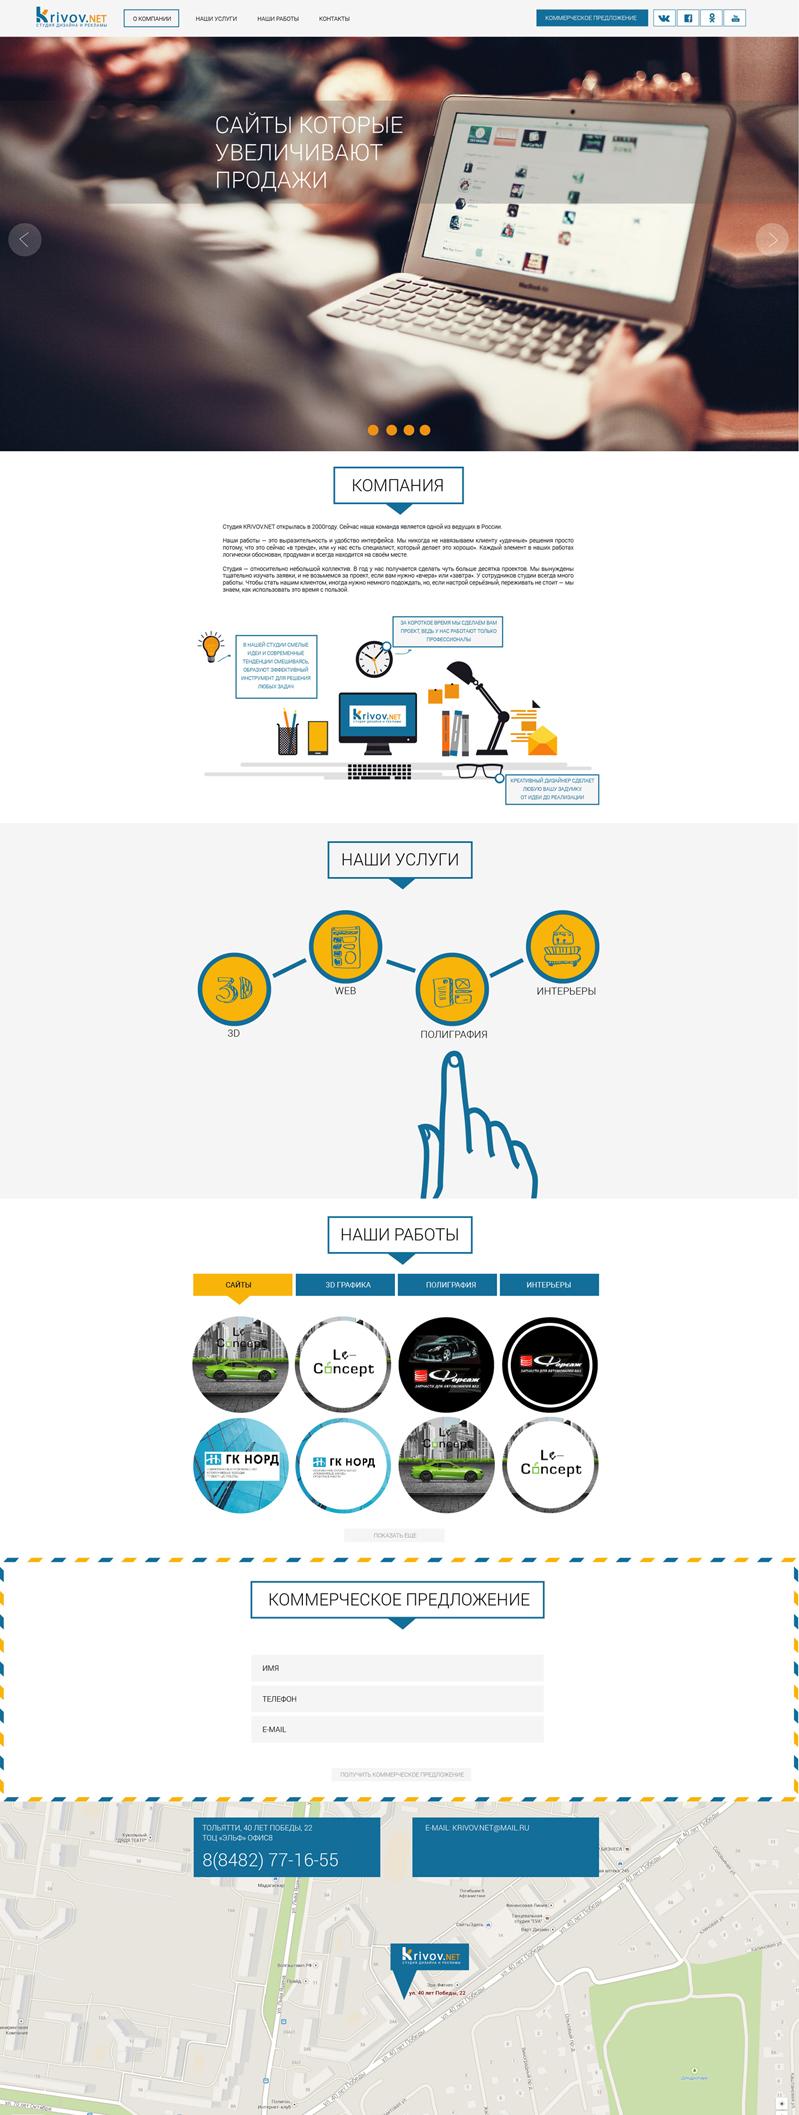 "Landing Page студия дизайна и рекламы ""Krivov.NET"""